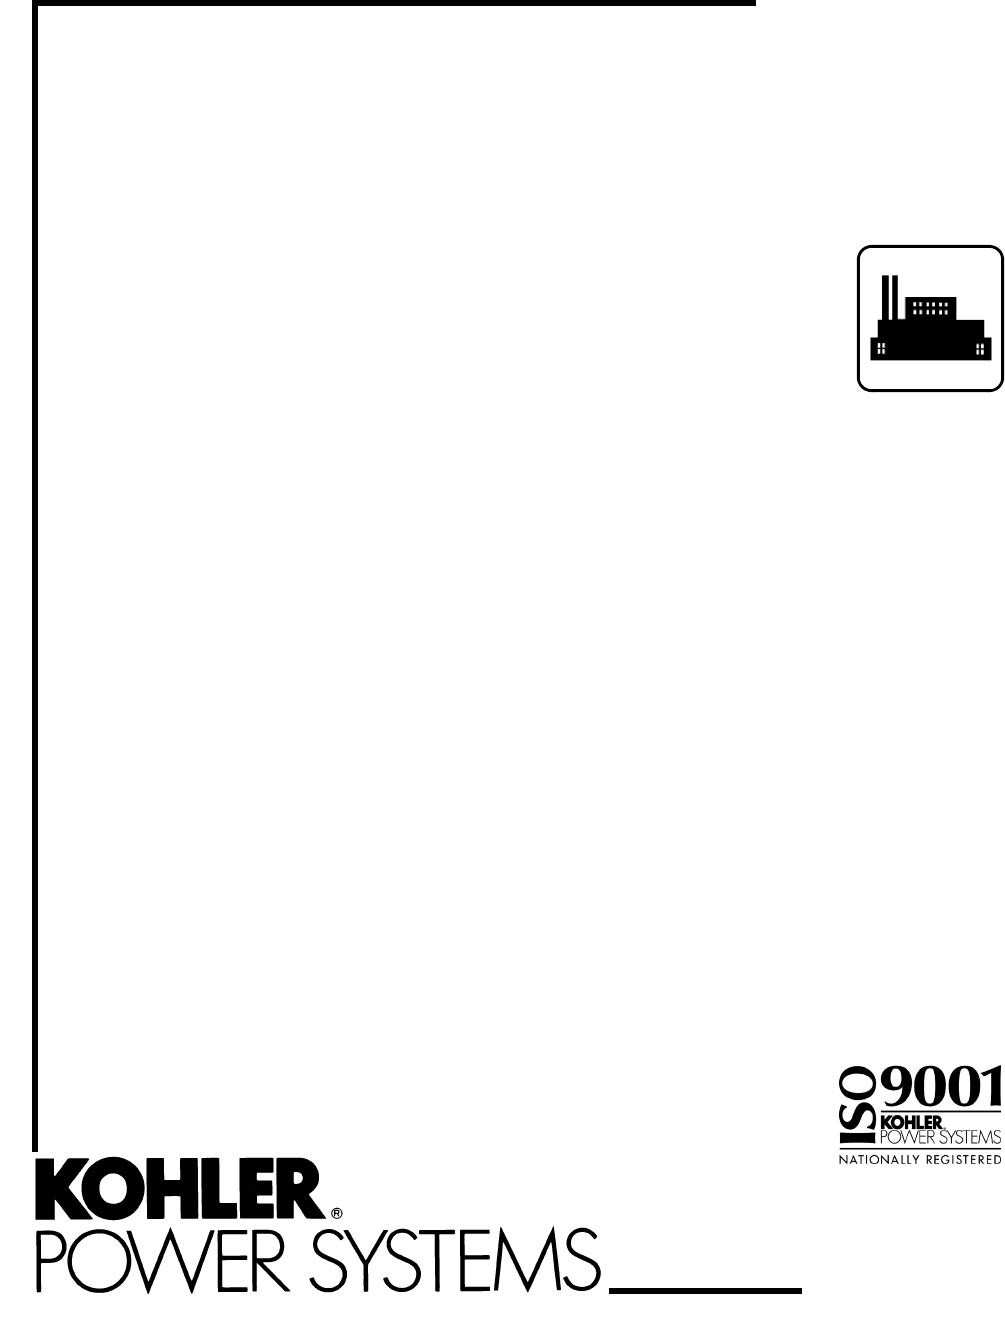 Kohler 20-3250 kW manual